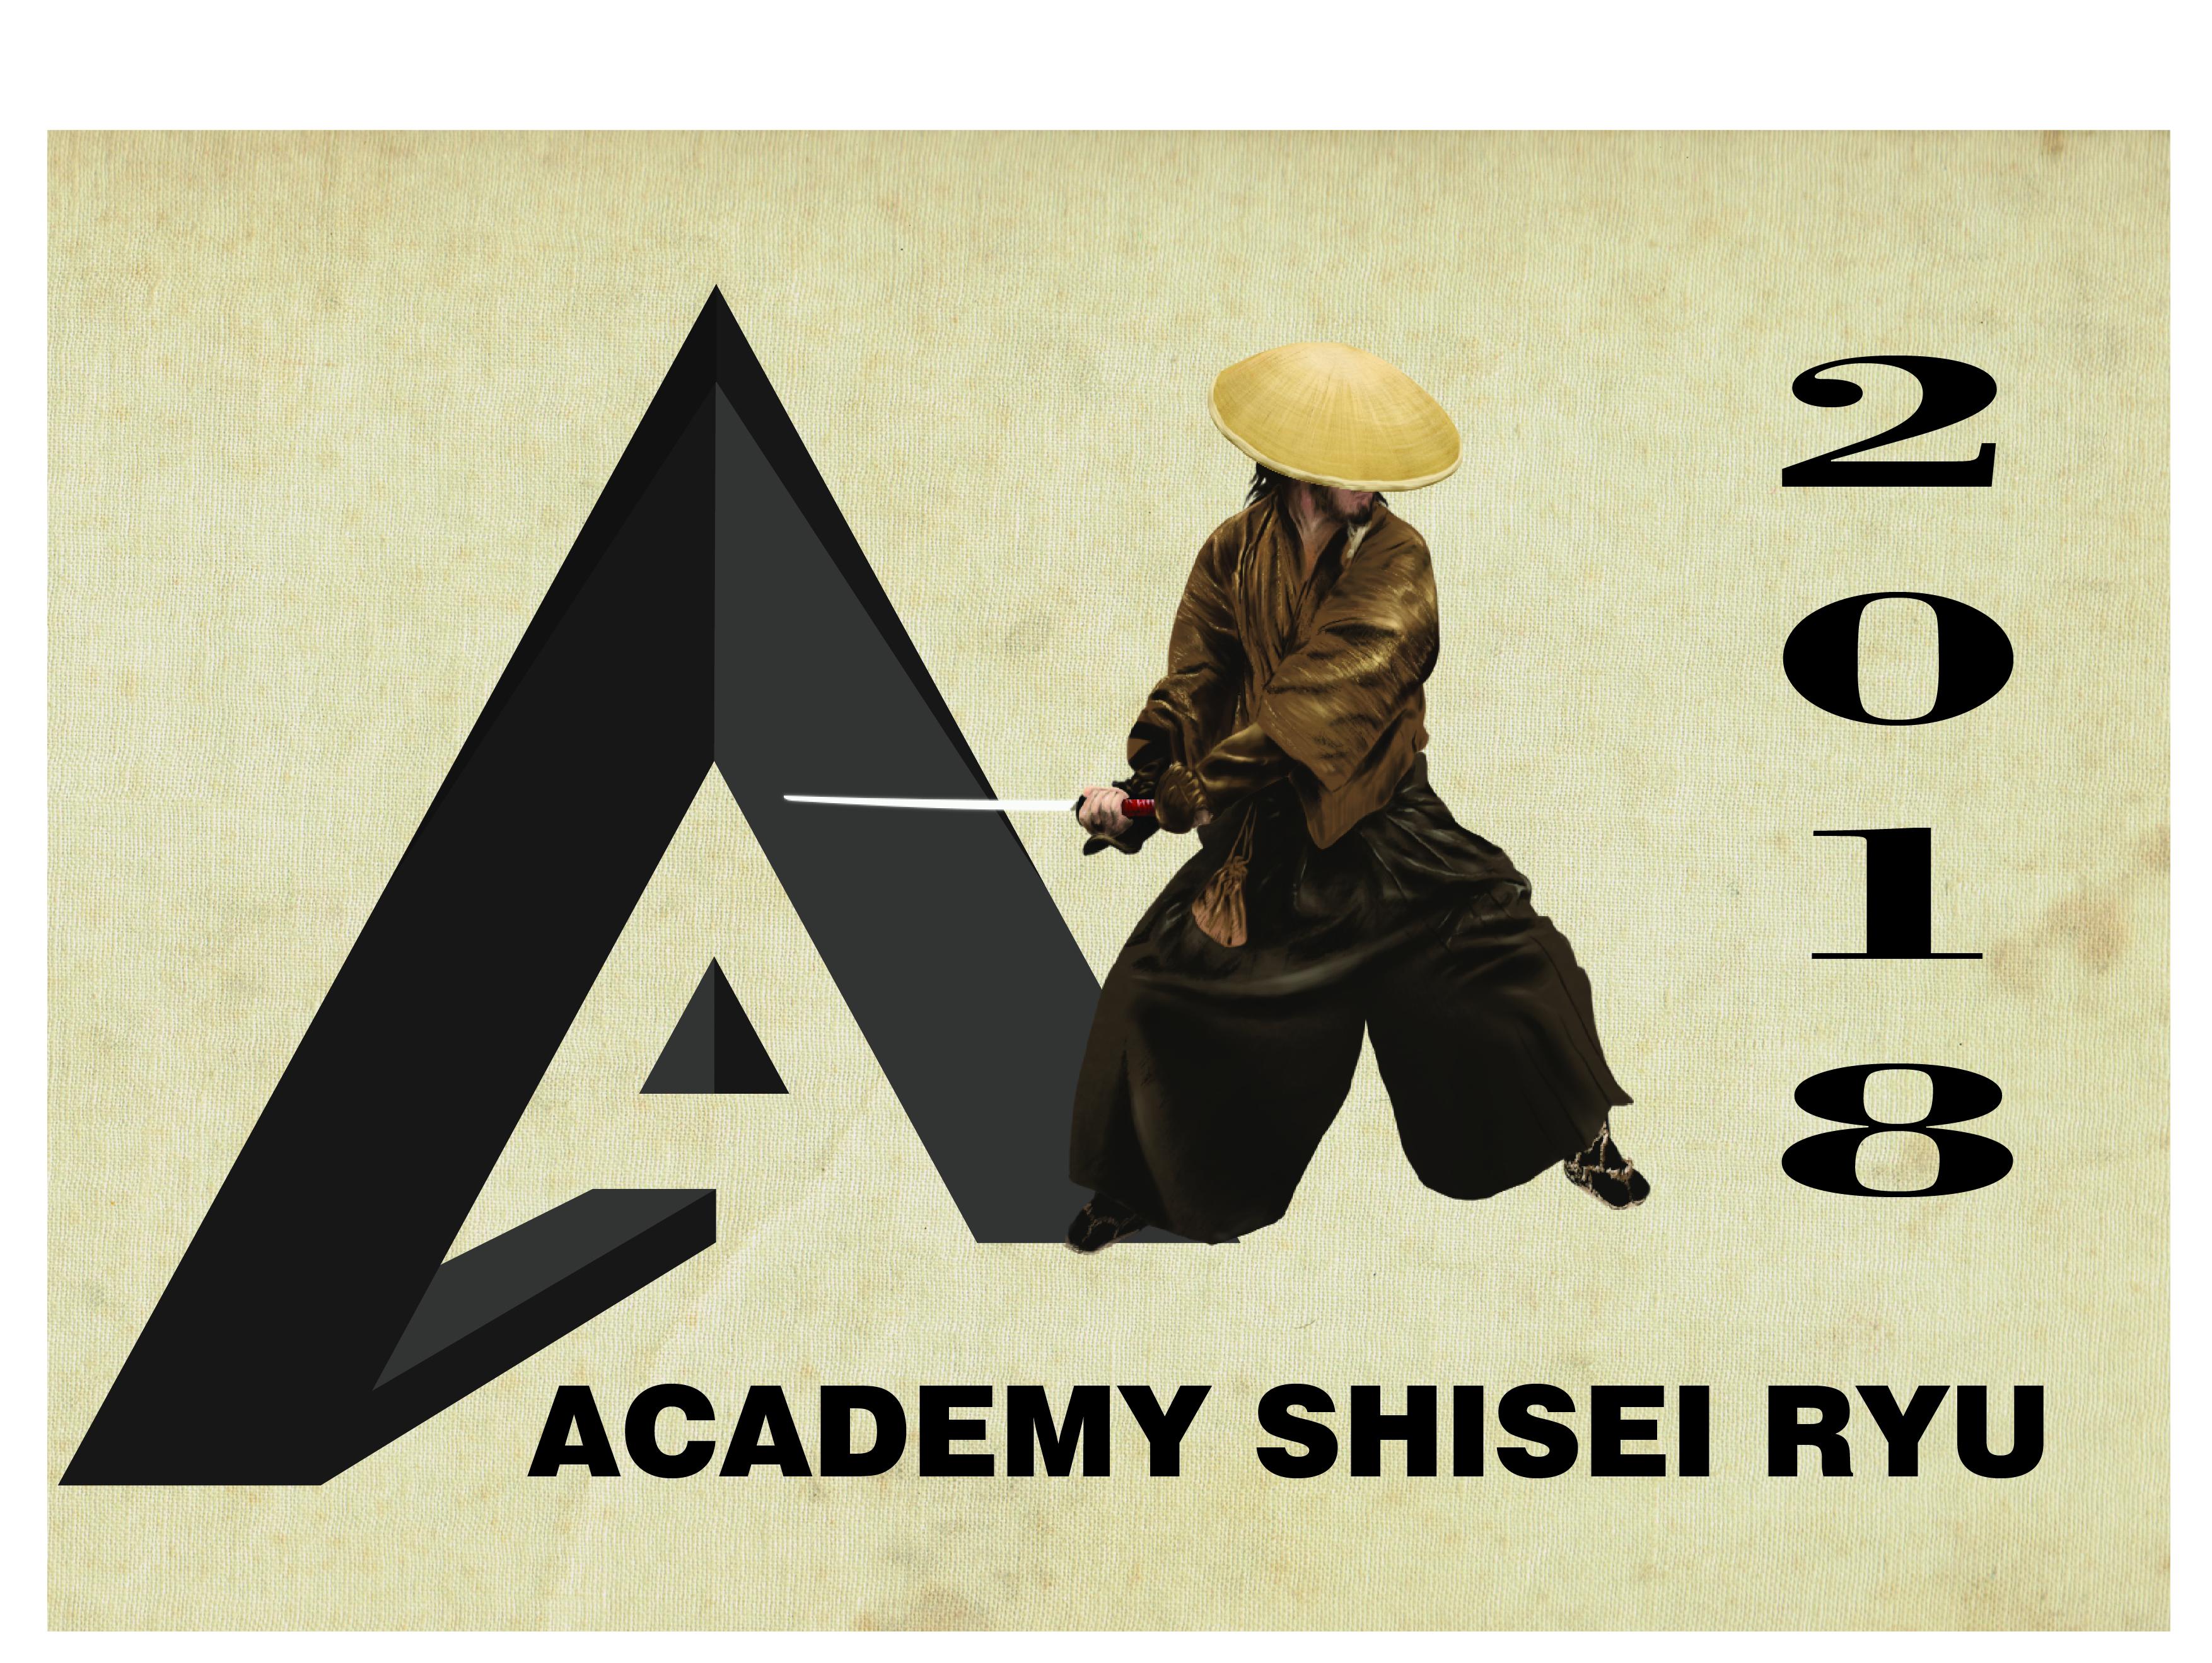 Academy Shisei Ryu 2018 (eng)